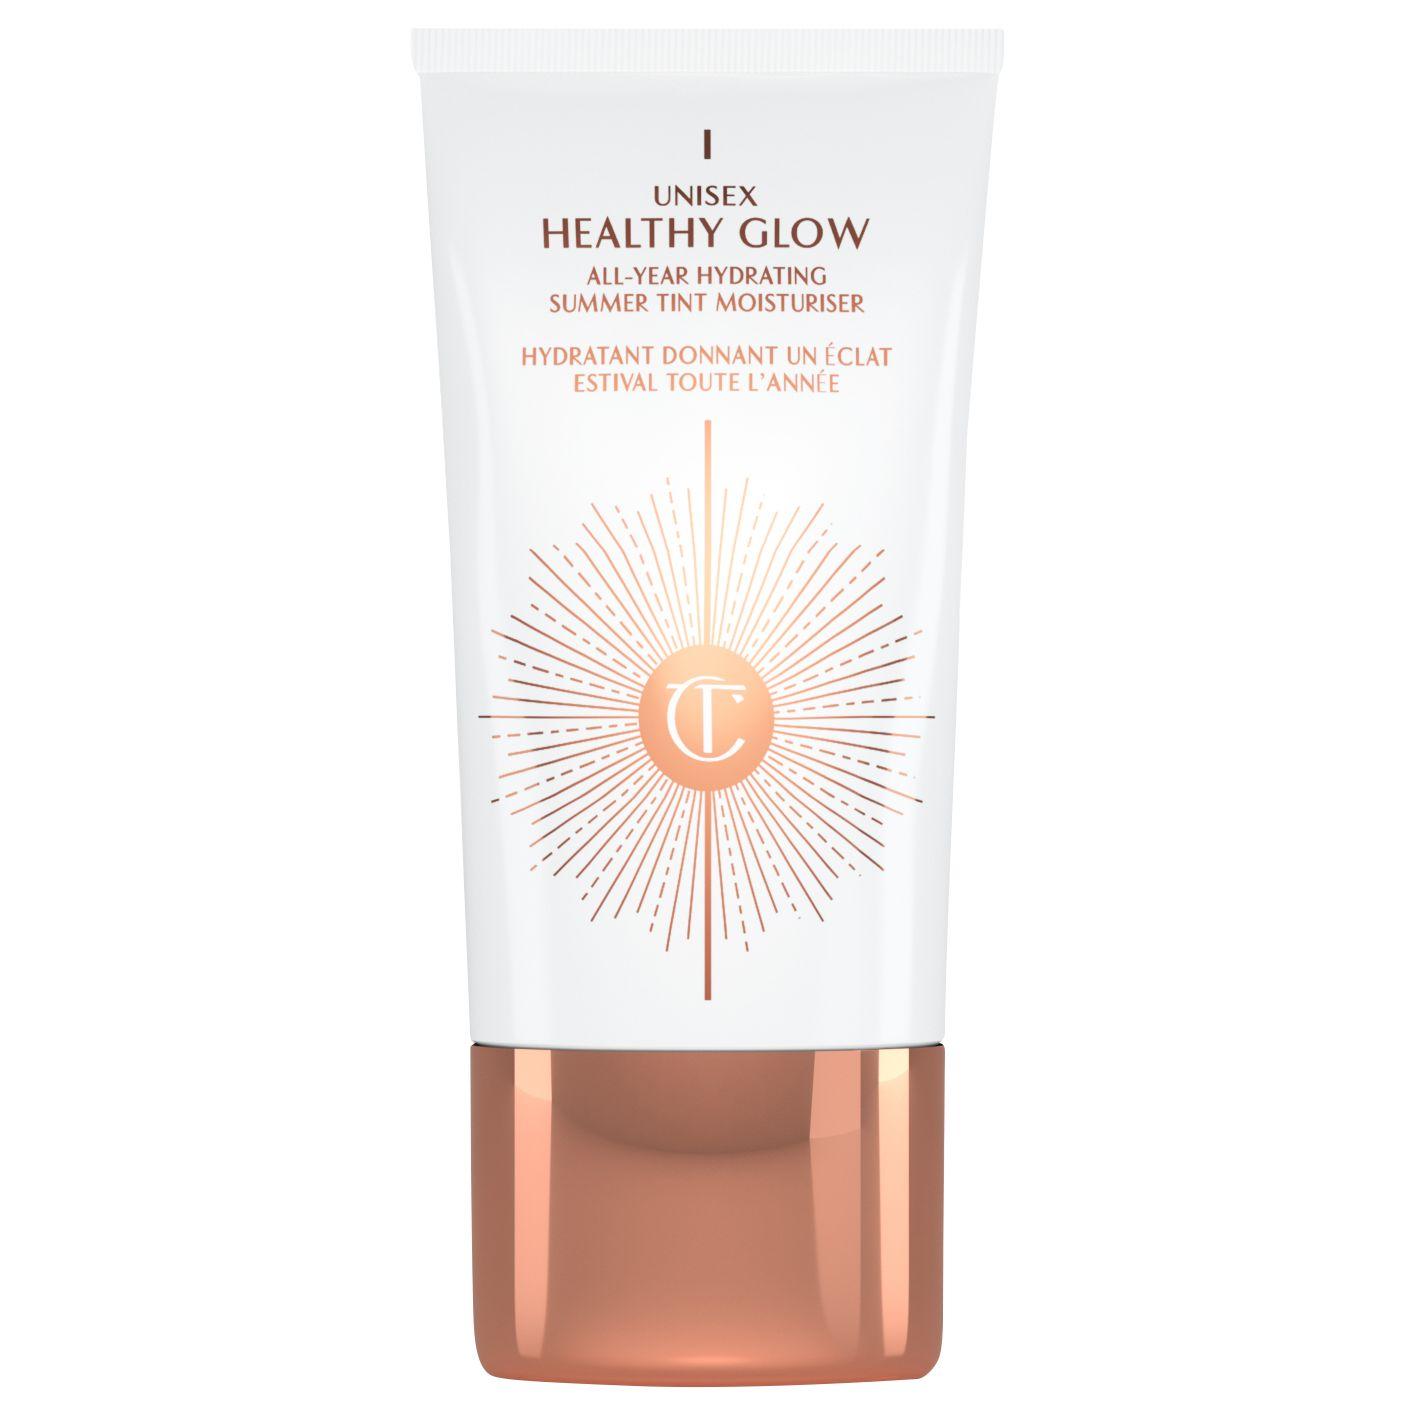 Charlotte Tilbury Charlotte Tilbury Unisex Healthy Glow All-Year Hydrating Summer Tint Moisturiser, 40ml